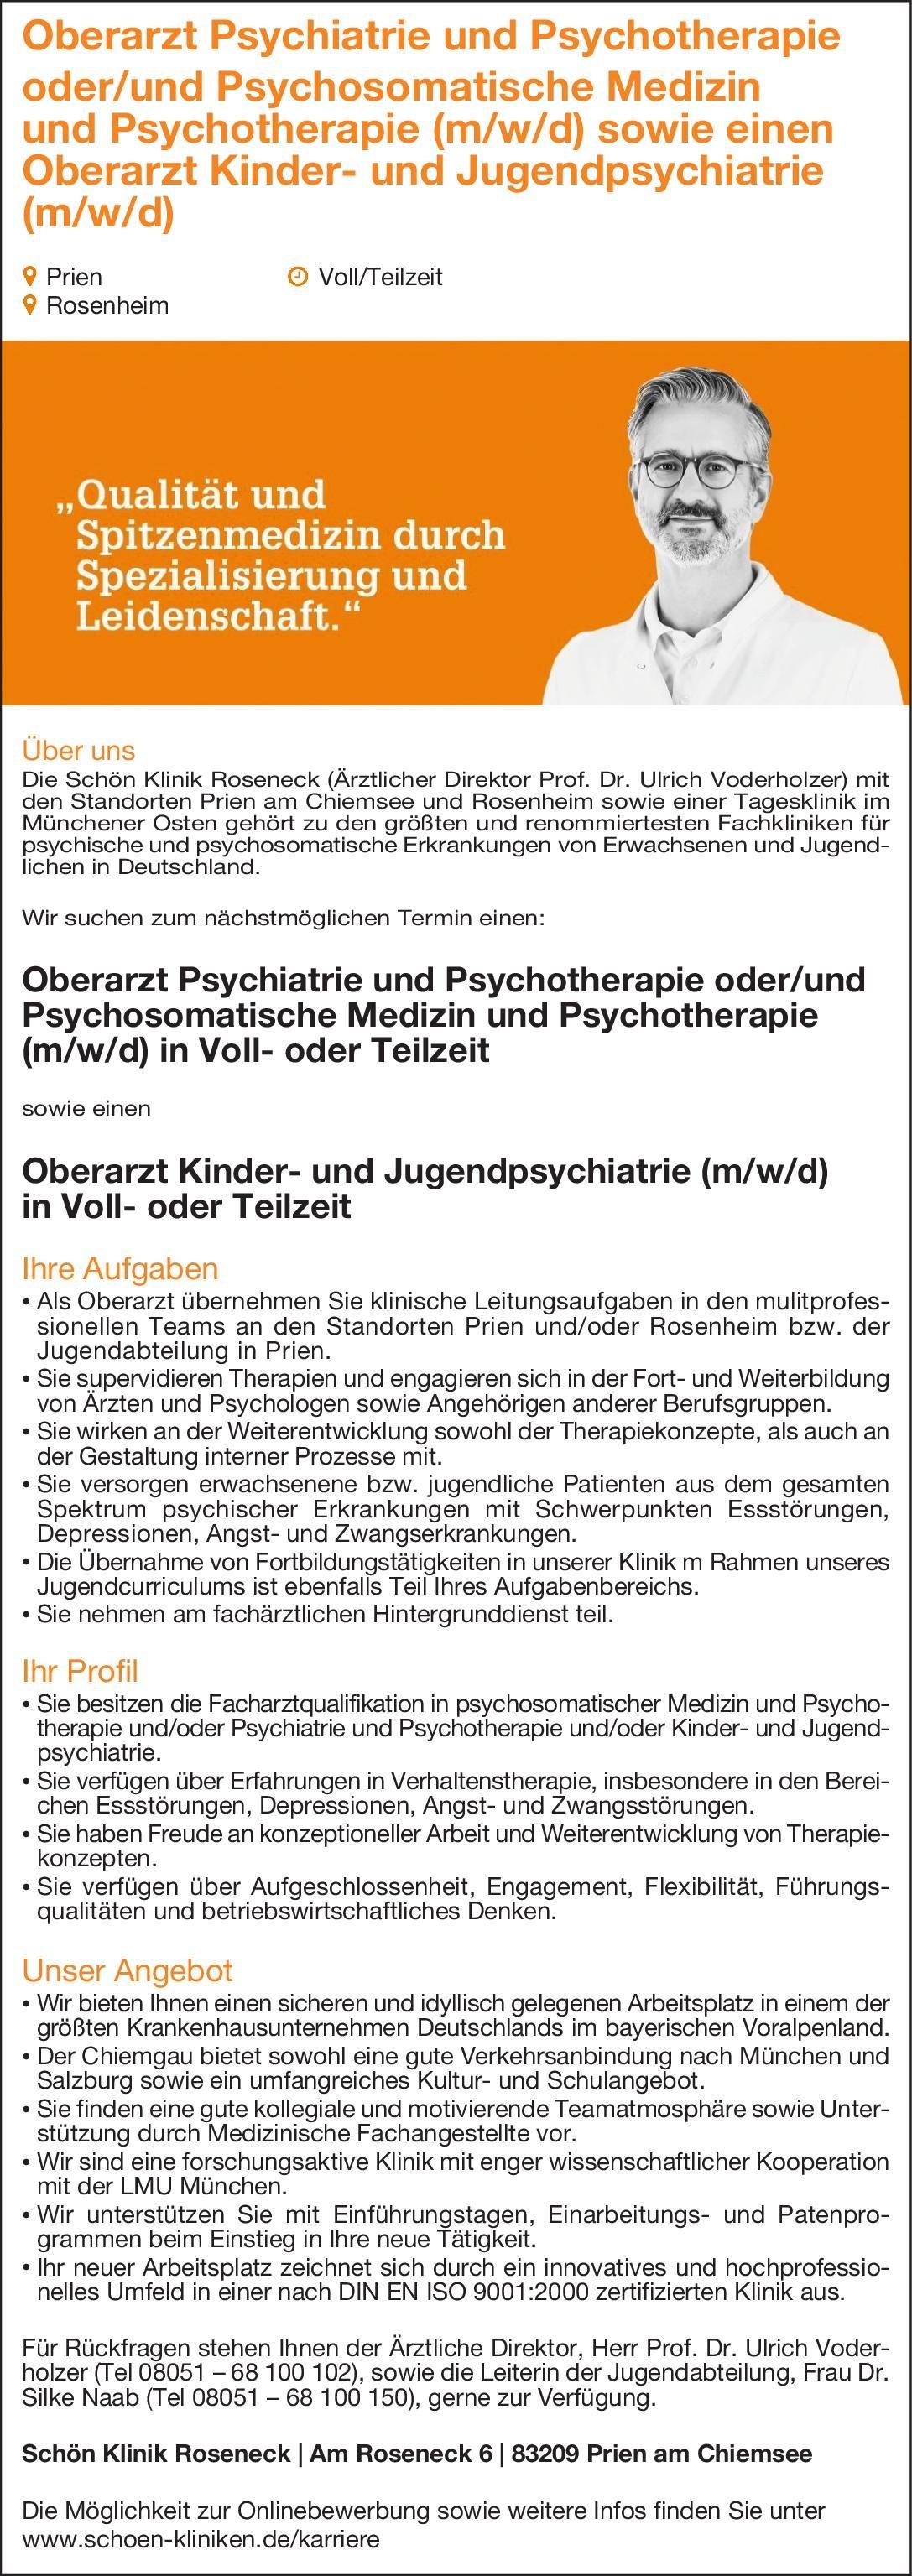 Schön Klinik Roseneck Oberarzt Psychiatrie und Psychotherapie  Psychiatrie und Psychotherapie, Psychiatrie und Psychotherapie Oberarzt